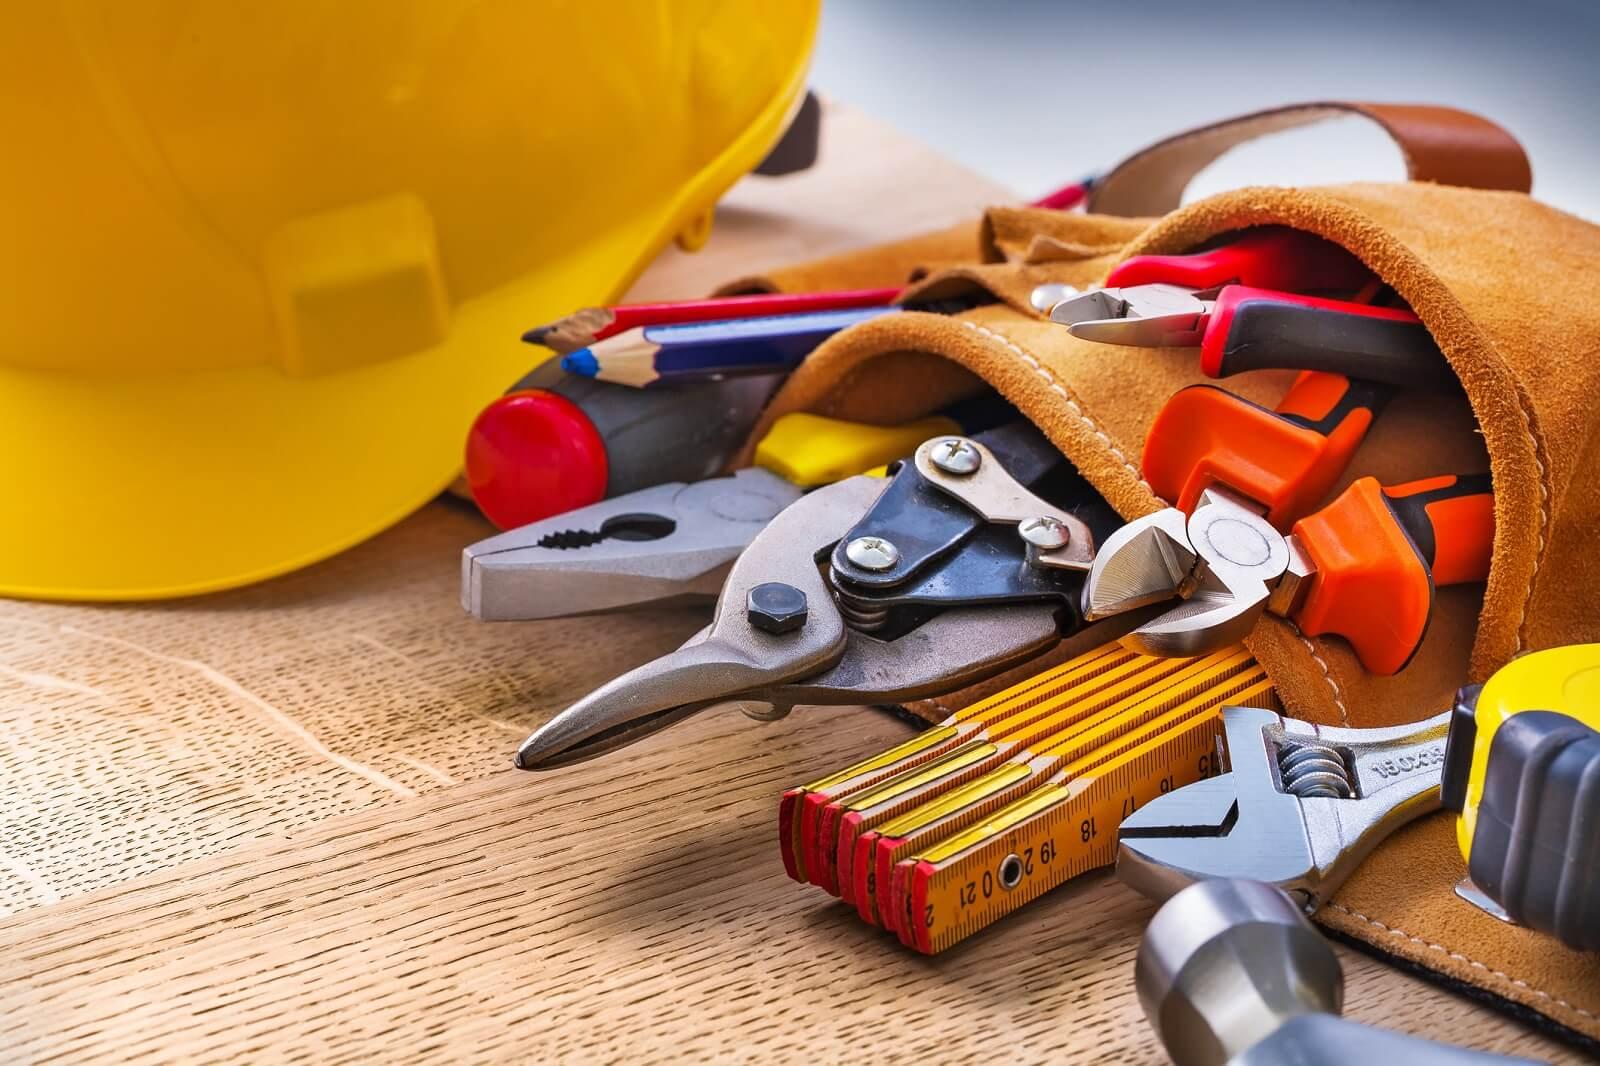 Granco Construction